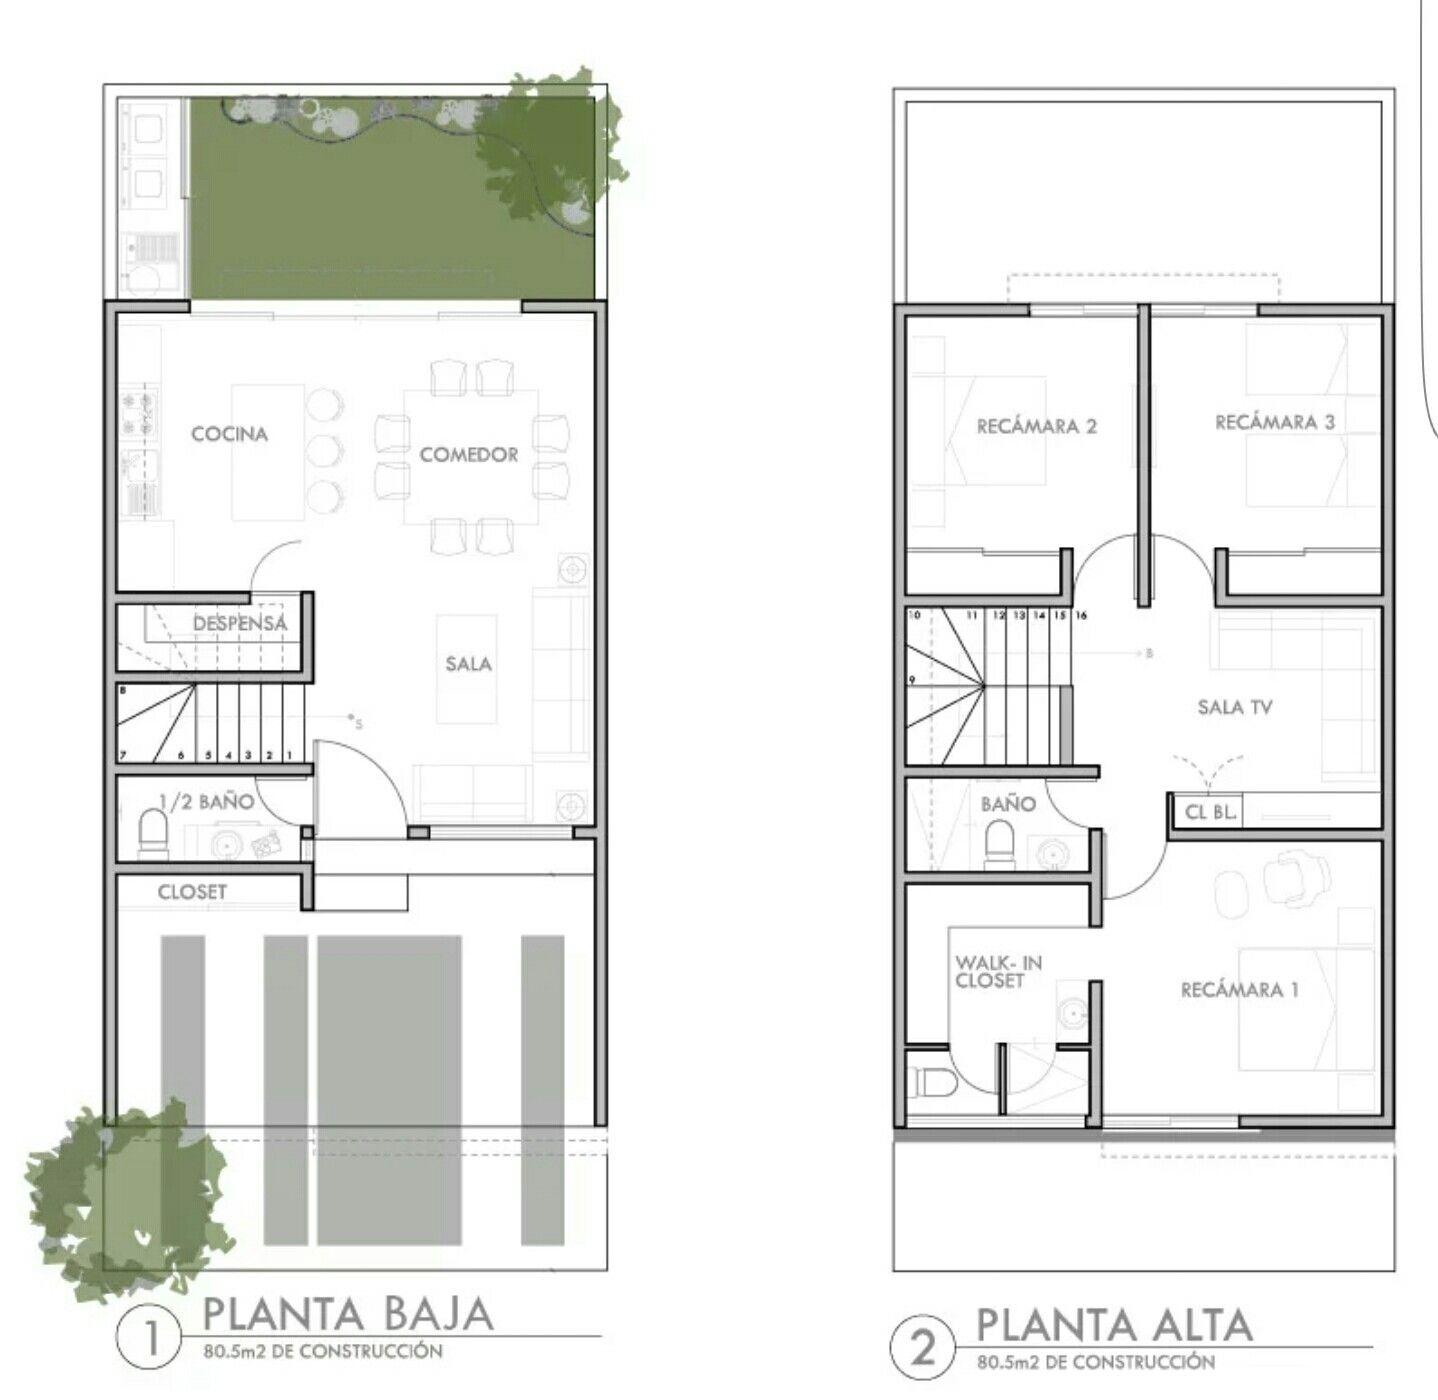 Pin de julius chesang en kitengela en 2019 house plans - Planos casas de una planta ...